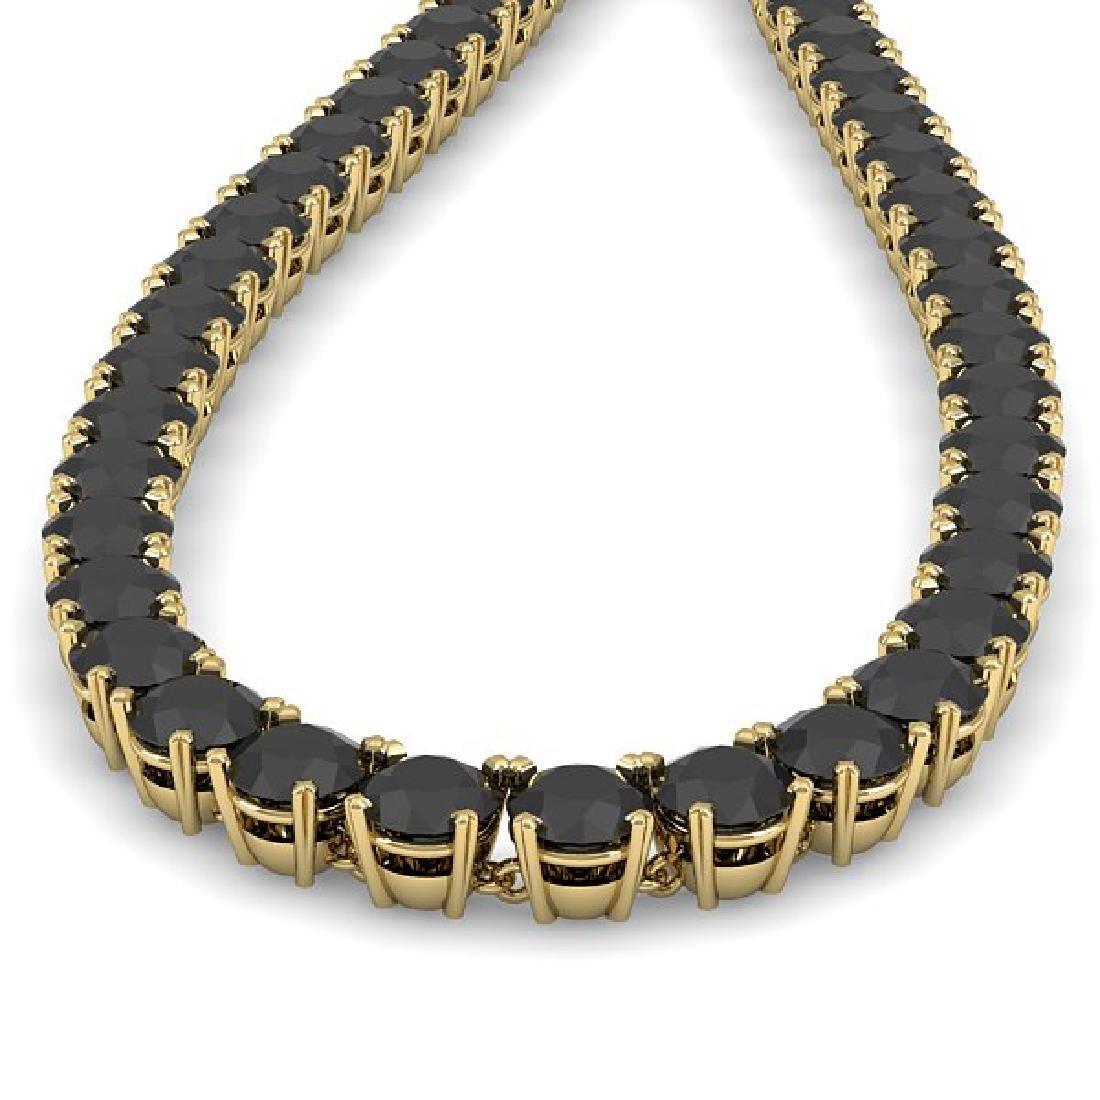 40 CTW Certified Black VS Diamond Necklace 18K Yellow - 2